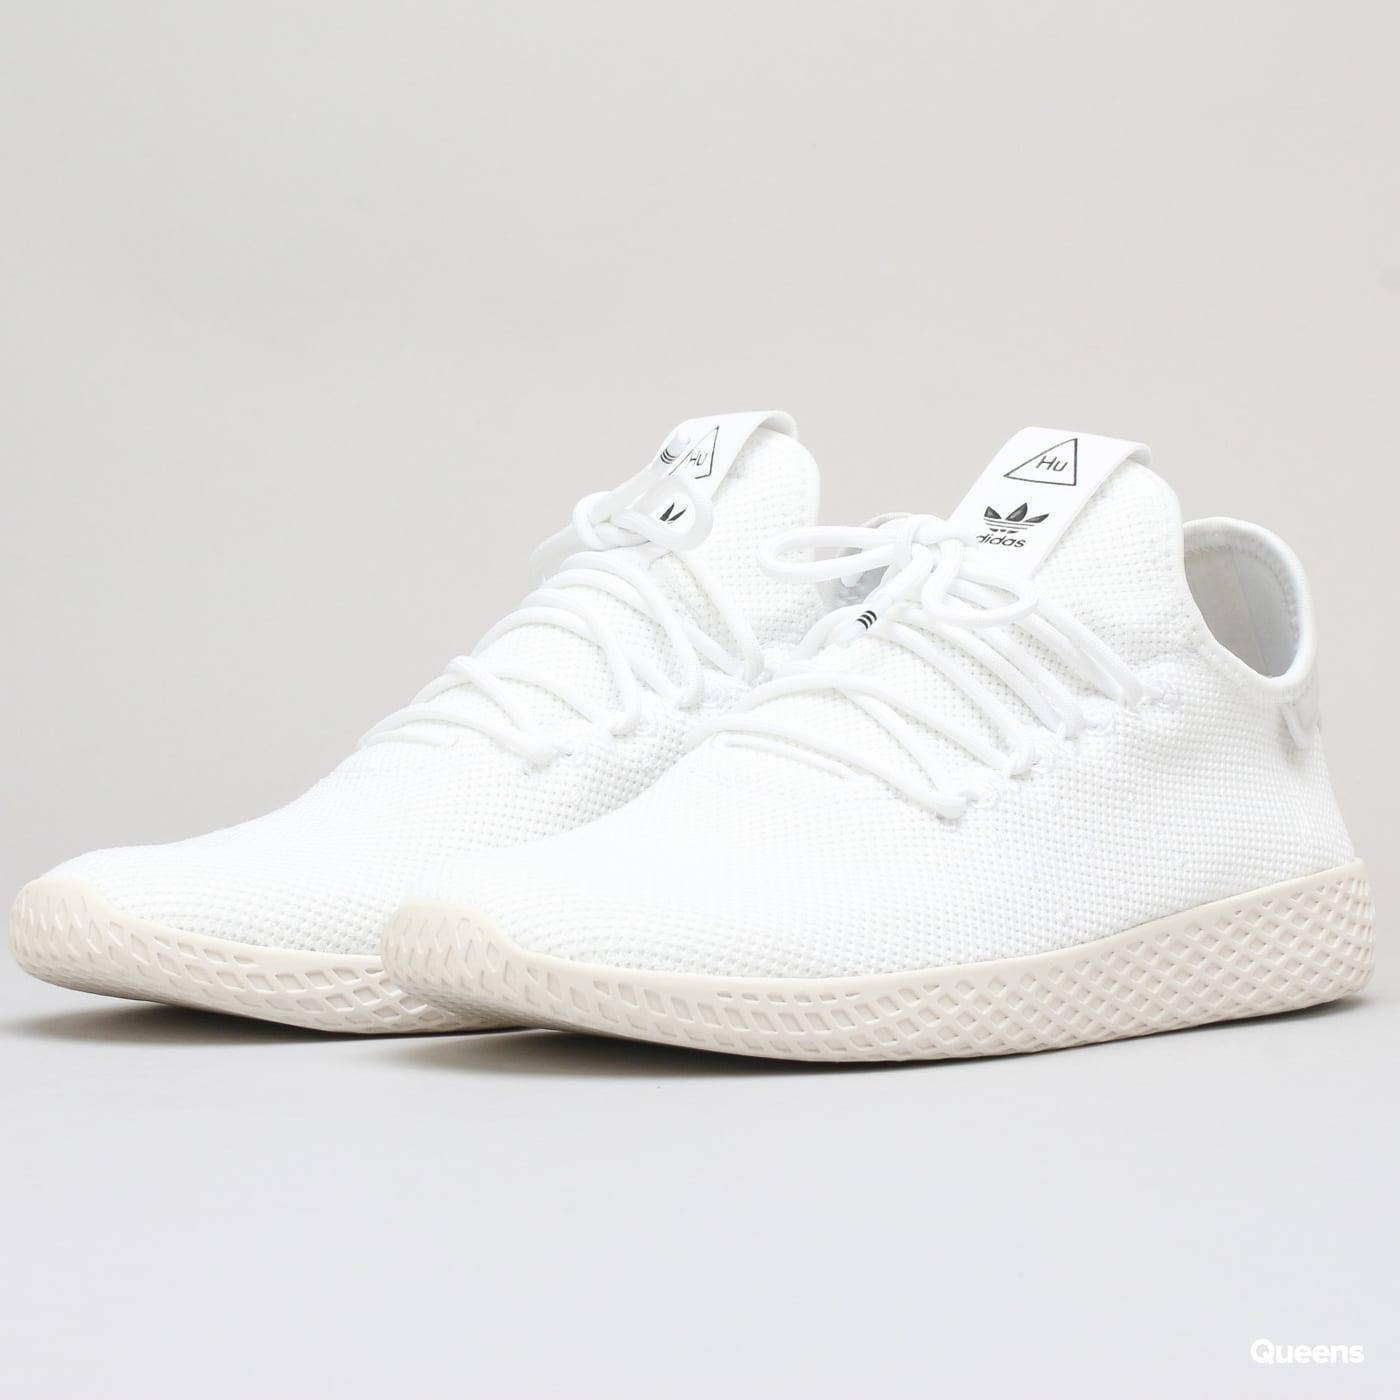 Sneakers adidas Pharrell Williams Tennis HU (B41792)– Queens 💚 d4b0f84e6